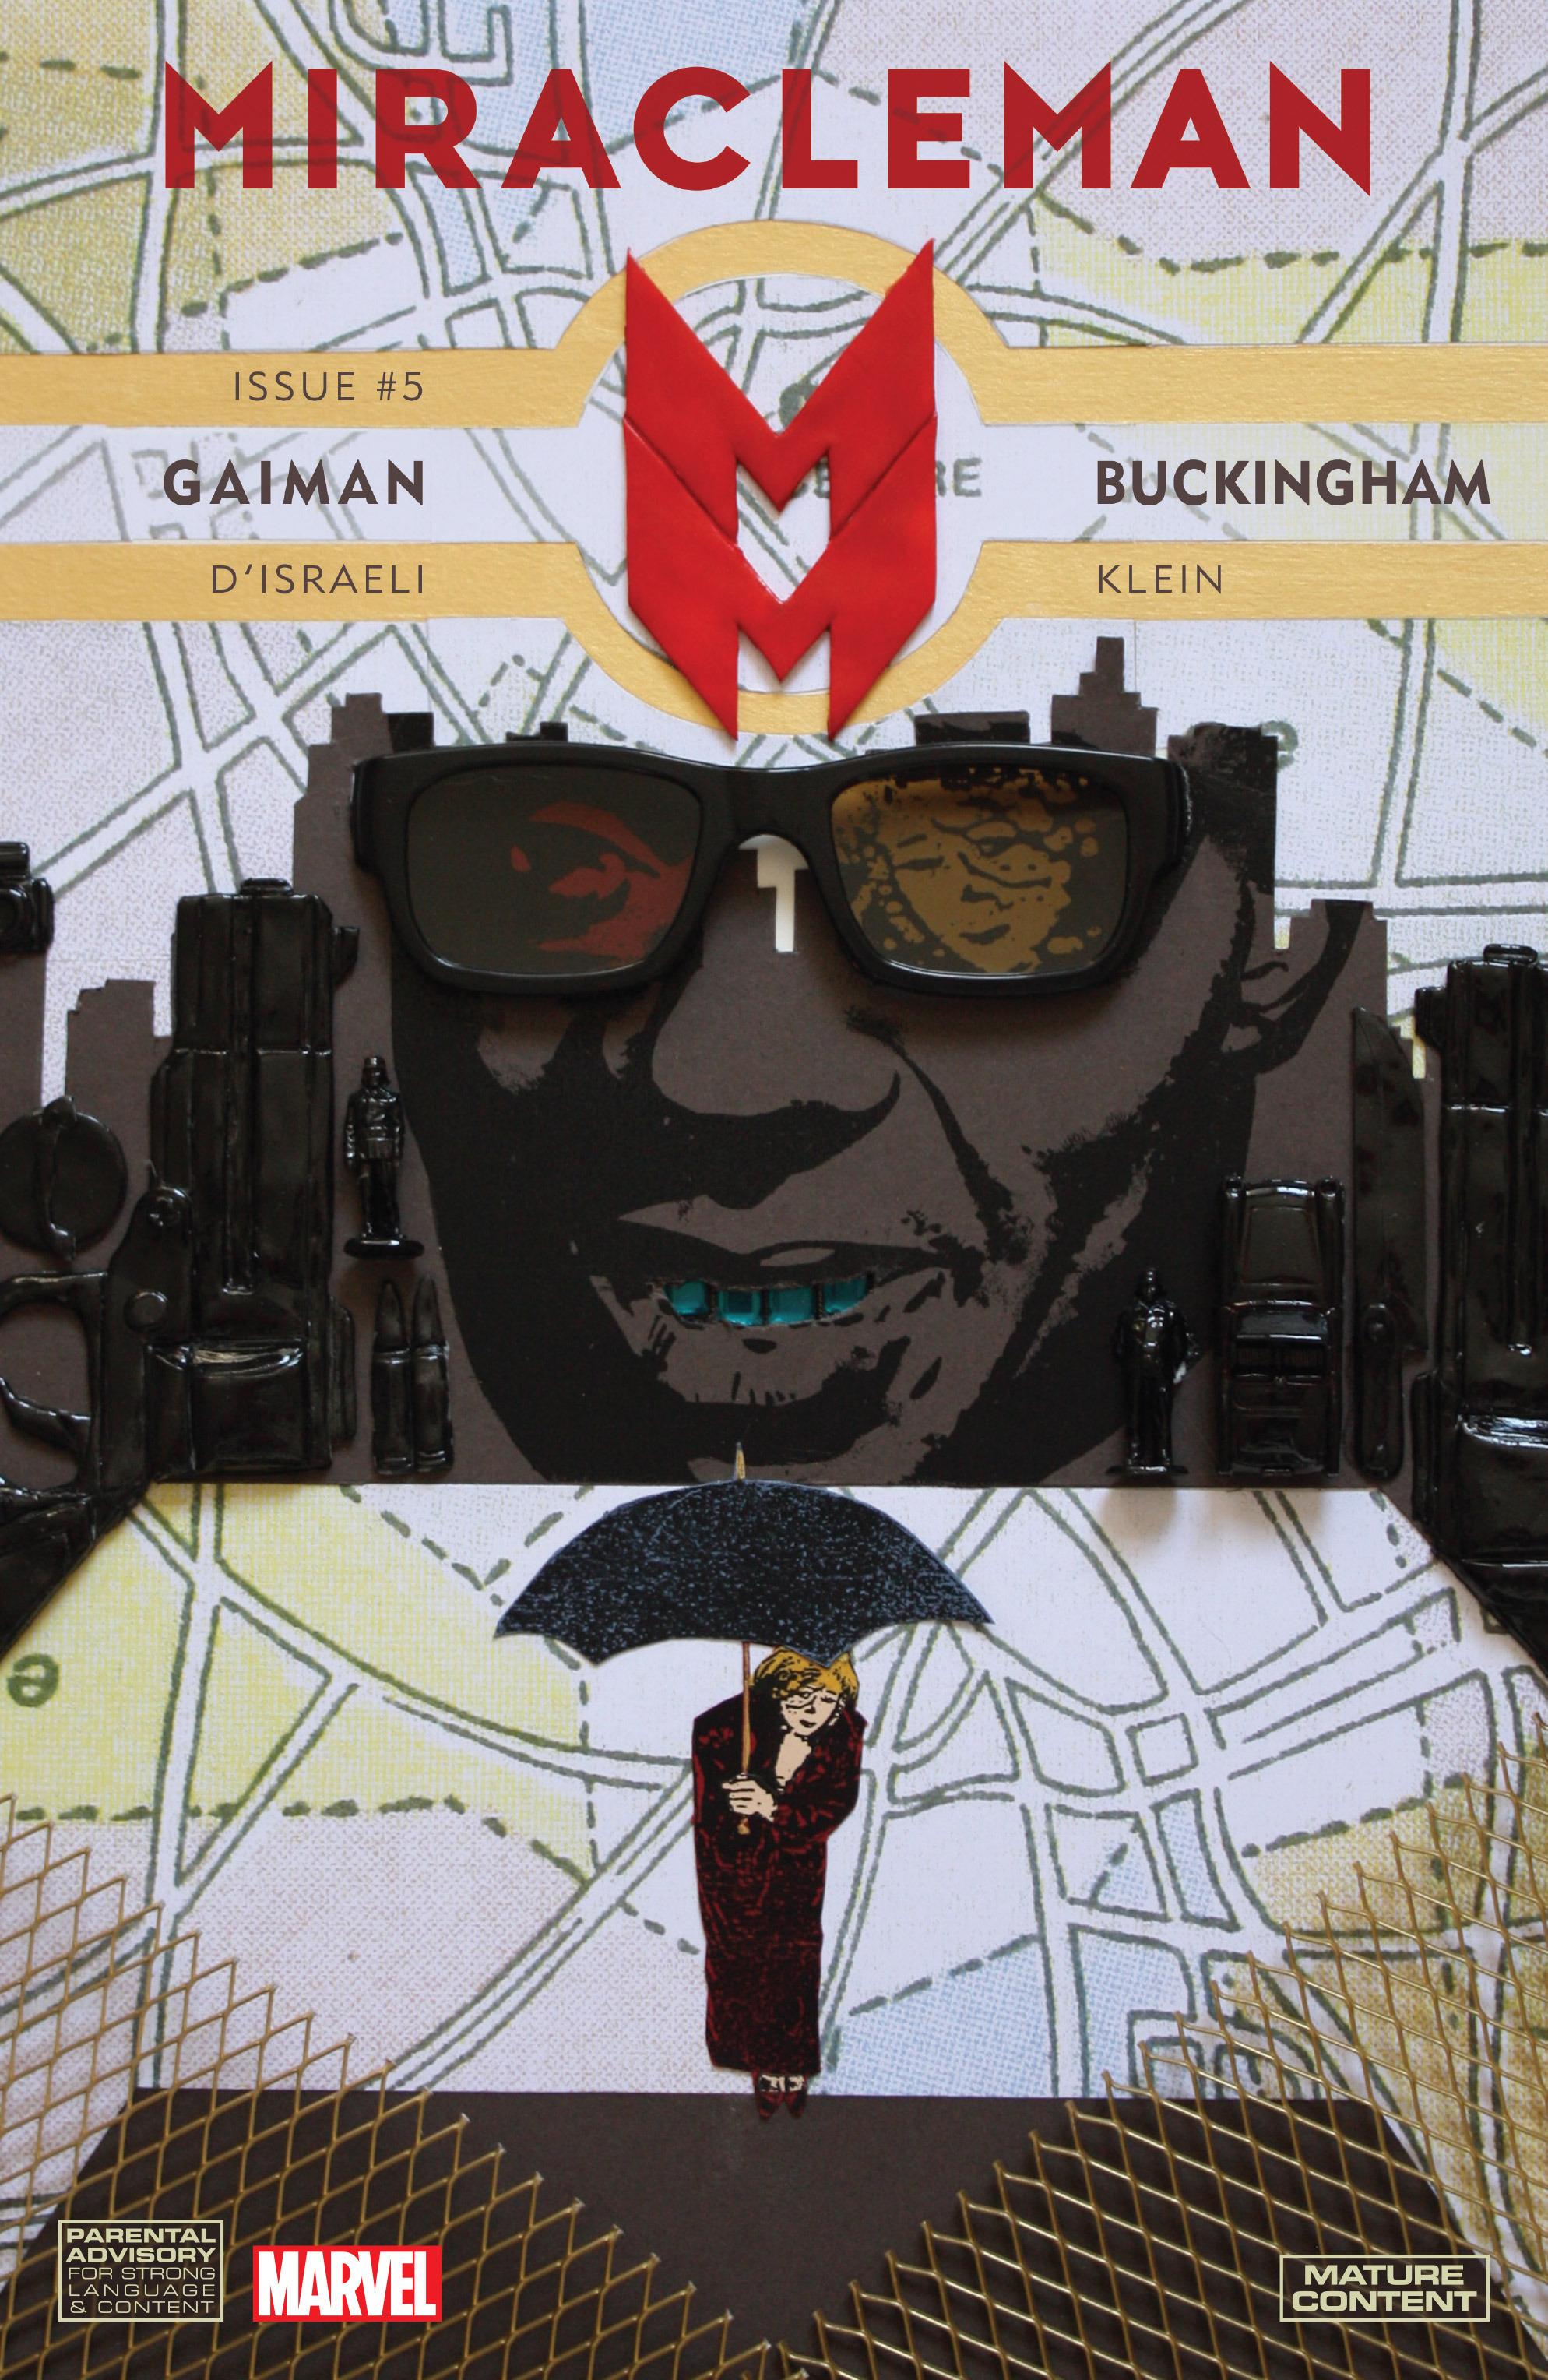 Miracleman by Gaiman & Buckingham Vol 1 5